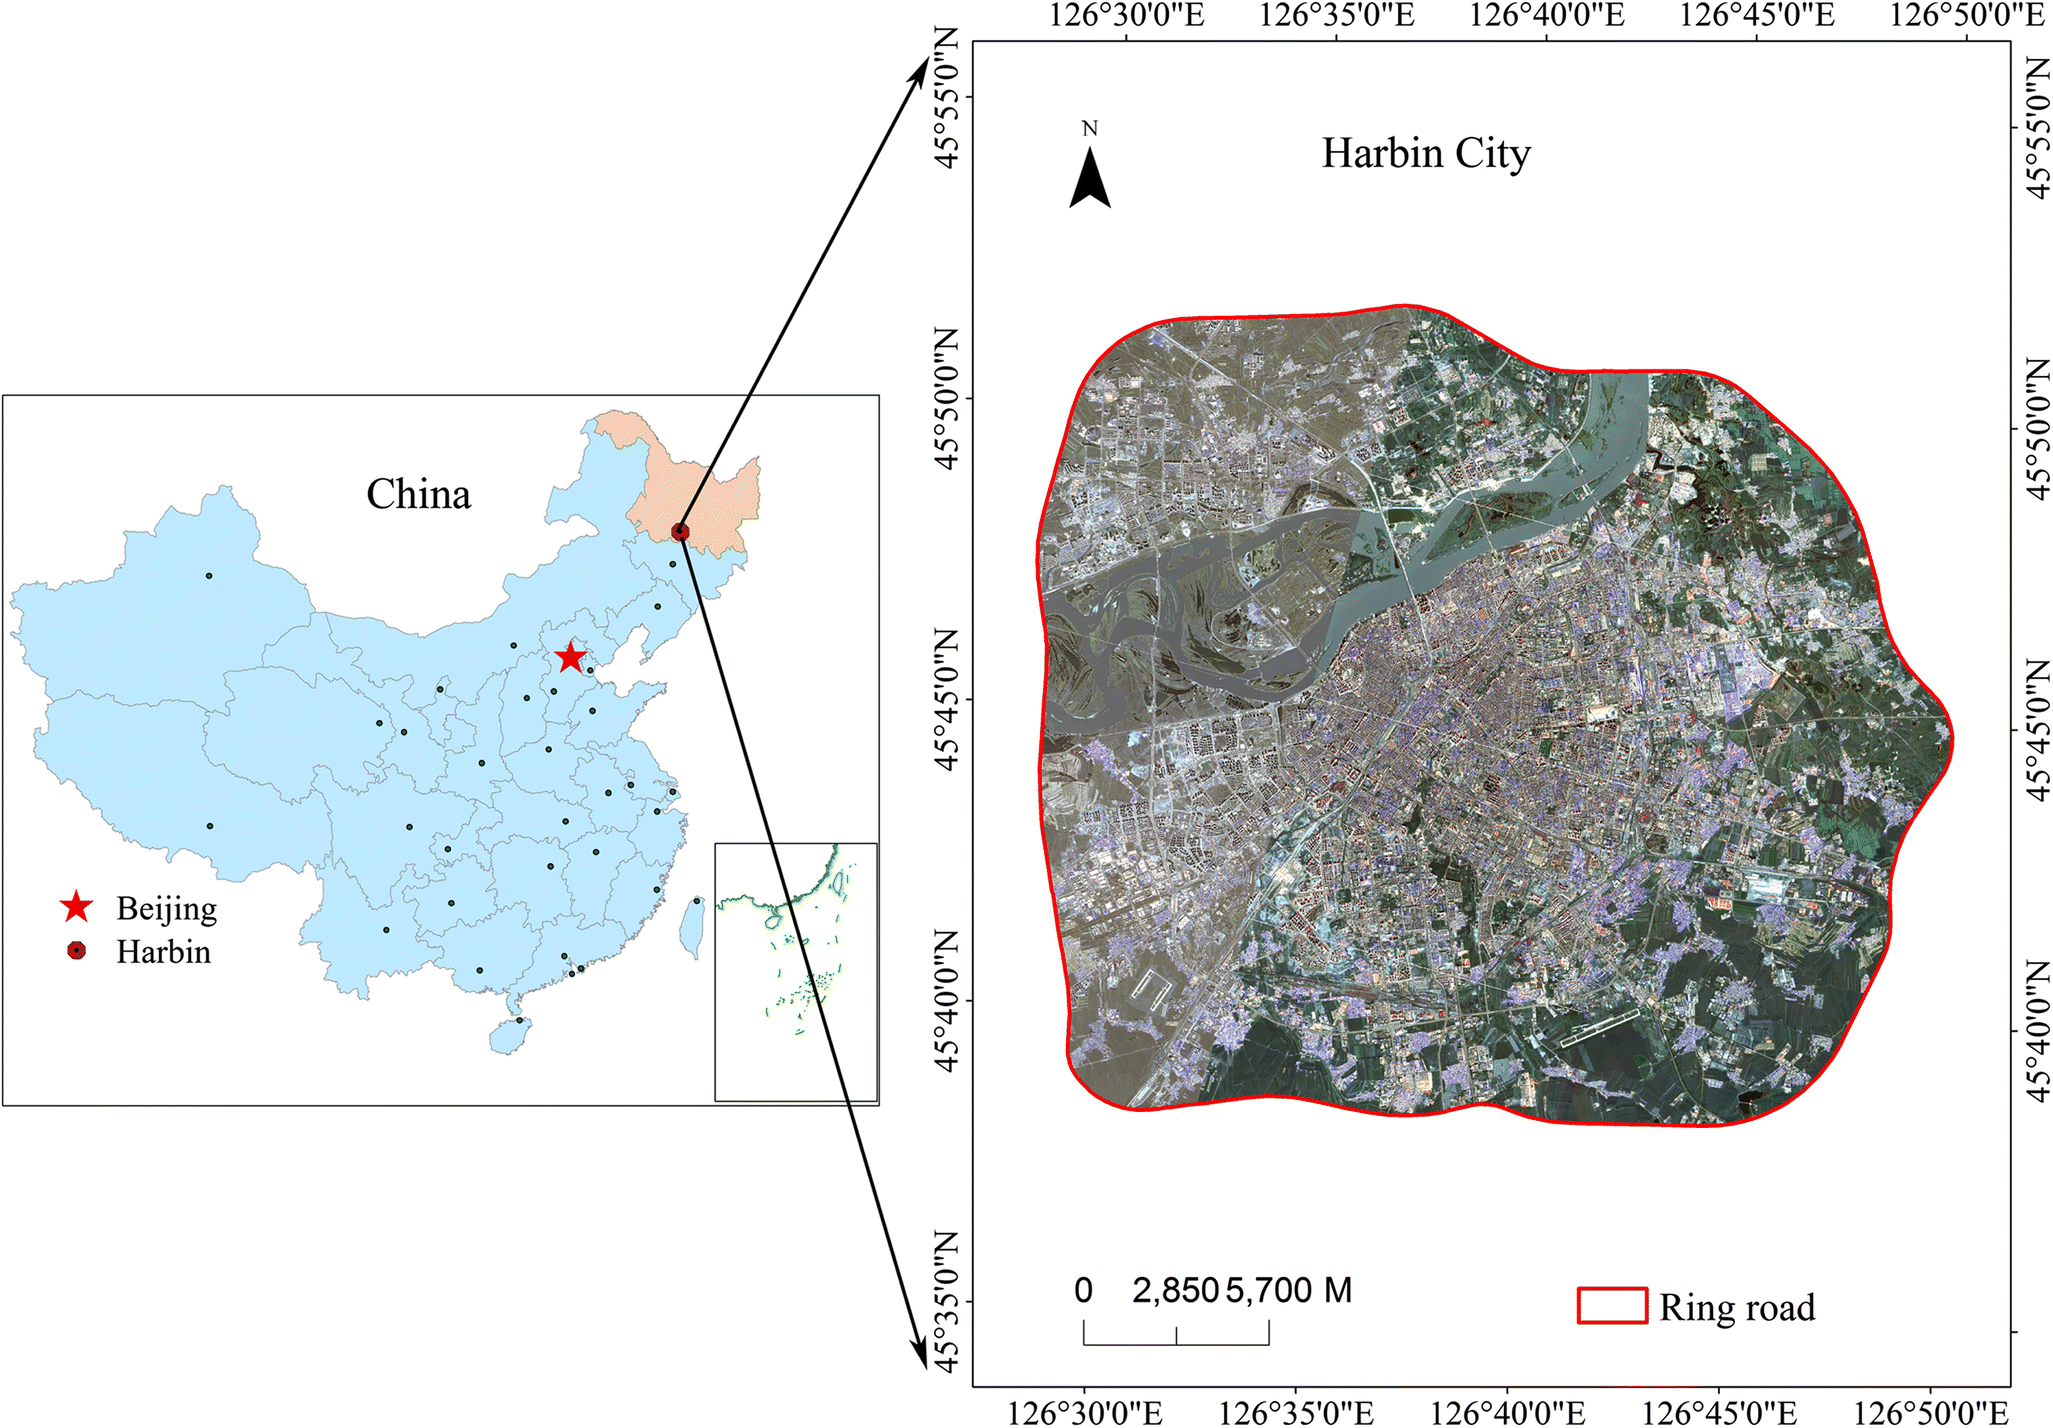 Perimeter-area ratio effects of urbanization intensity on ... on